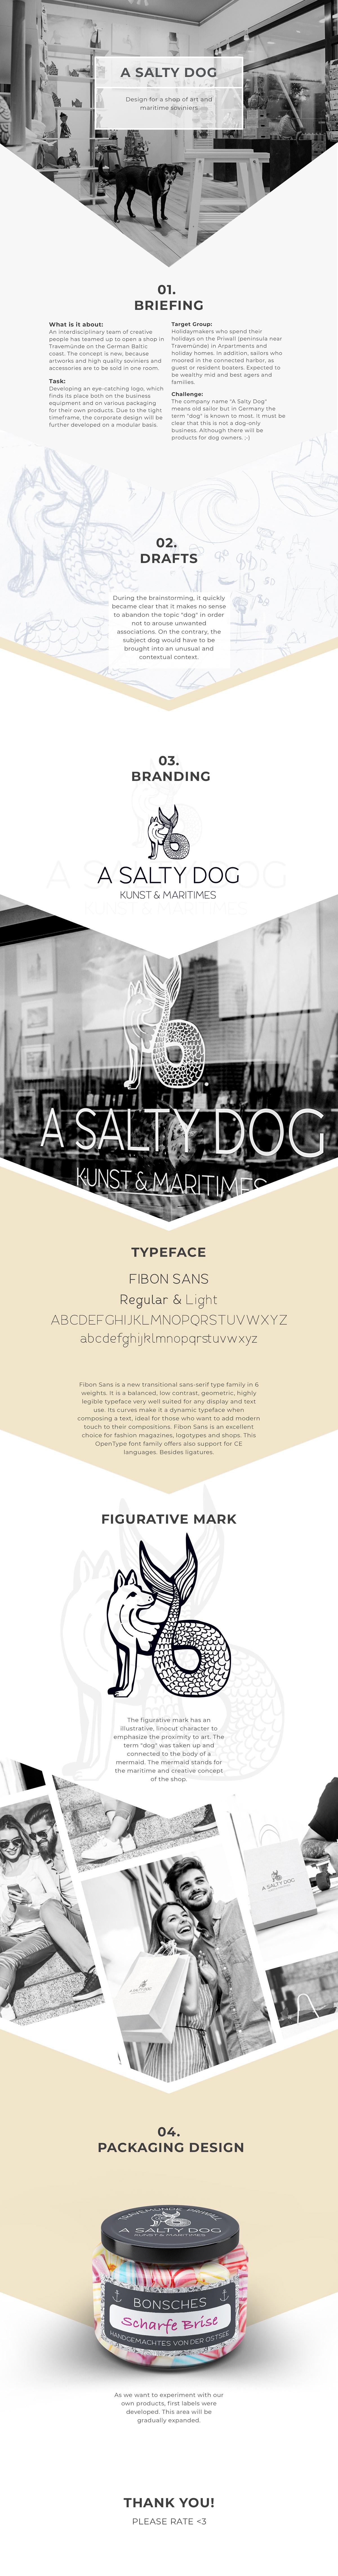 Adobe Portfolio,Corporate Design,logo,ILLUSTRATION ,Packaging,print,namefinding,shop,Adobe Dimension,adobe illustrator